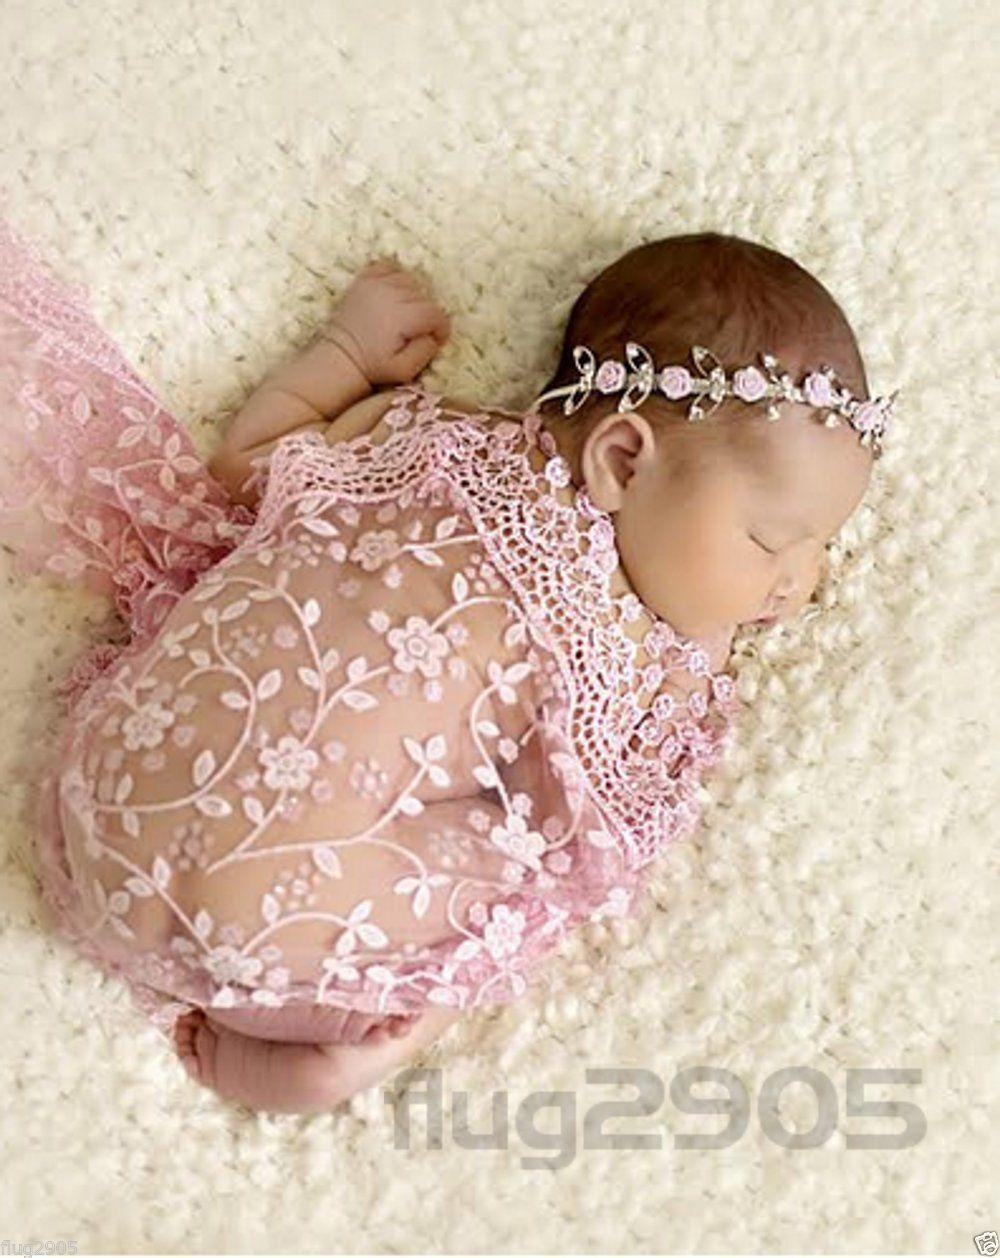 Baby Wrap Pucktuch rosa spitze Fotoshooting Newborn Neugeborenen Fotografie